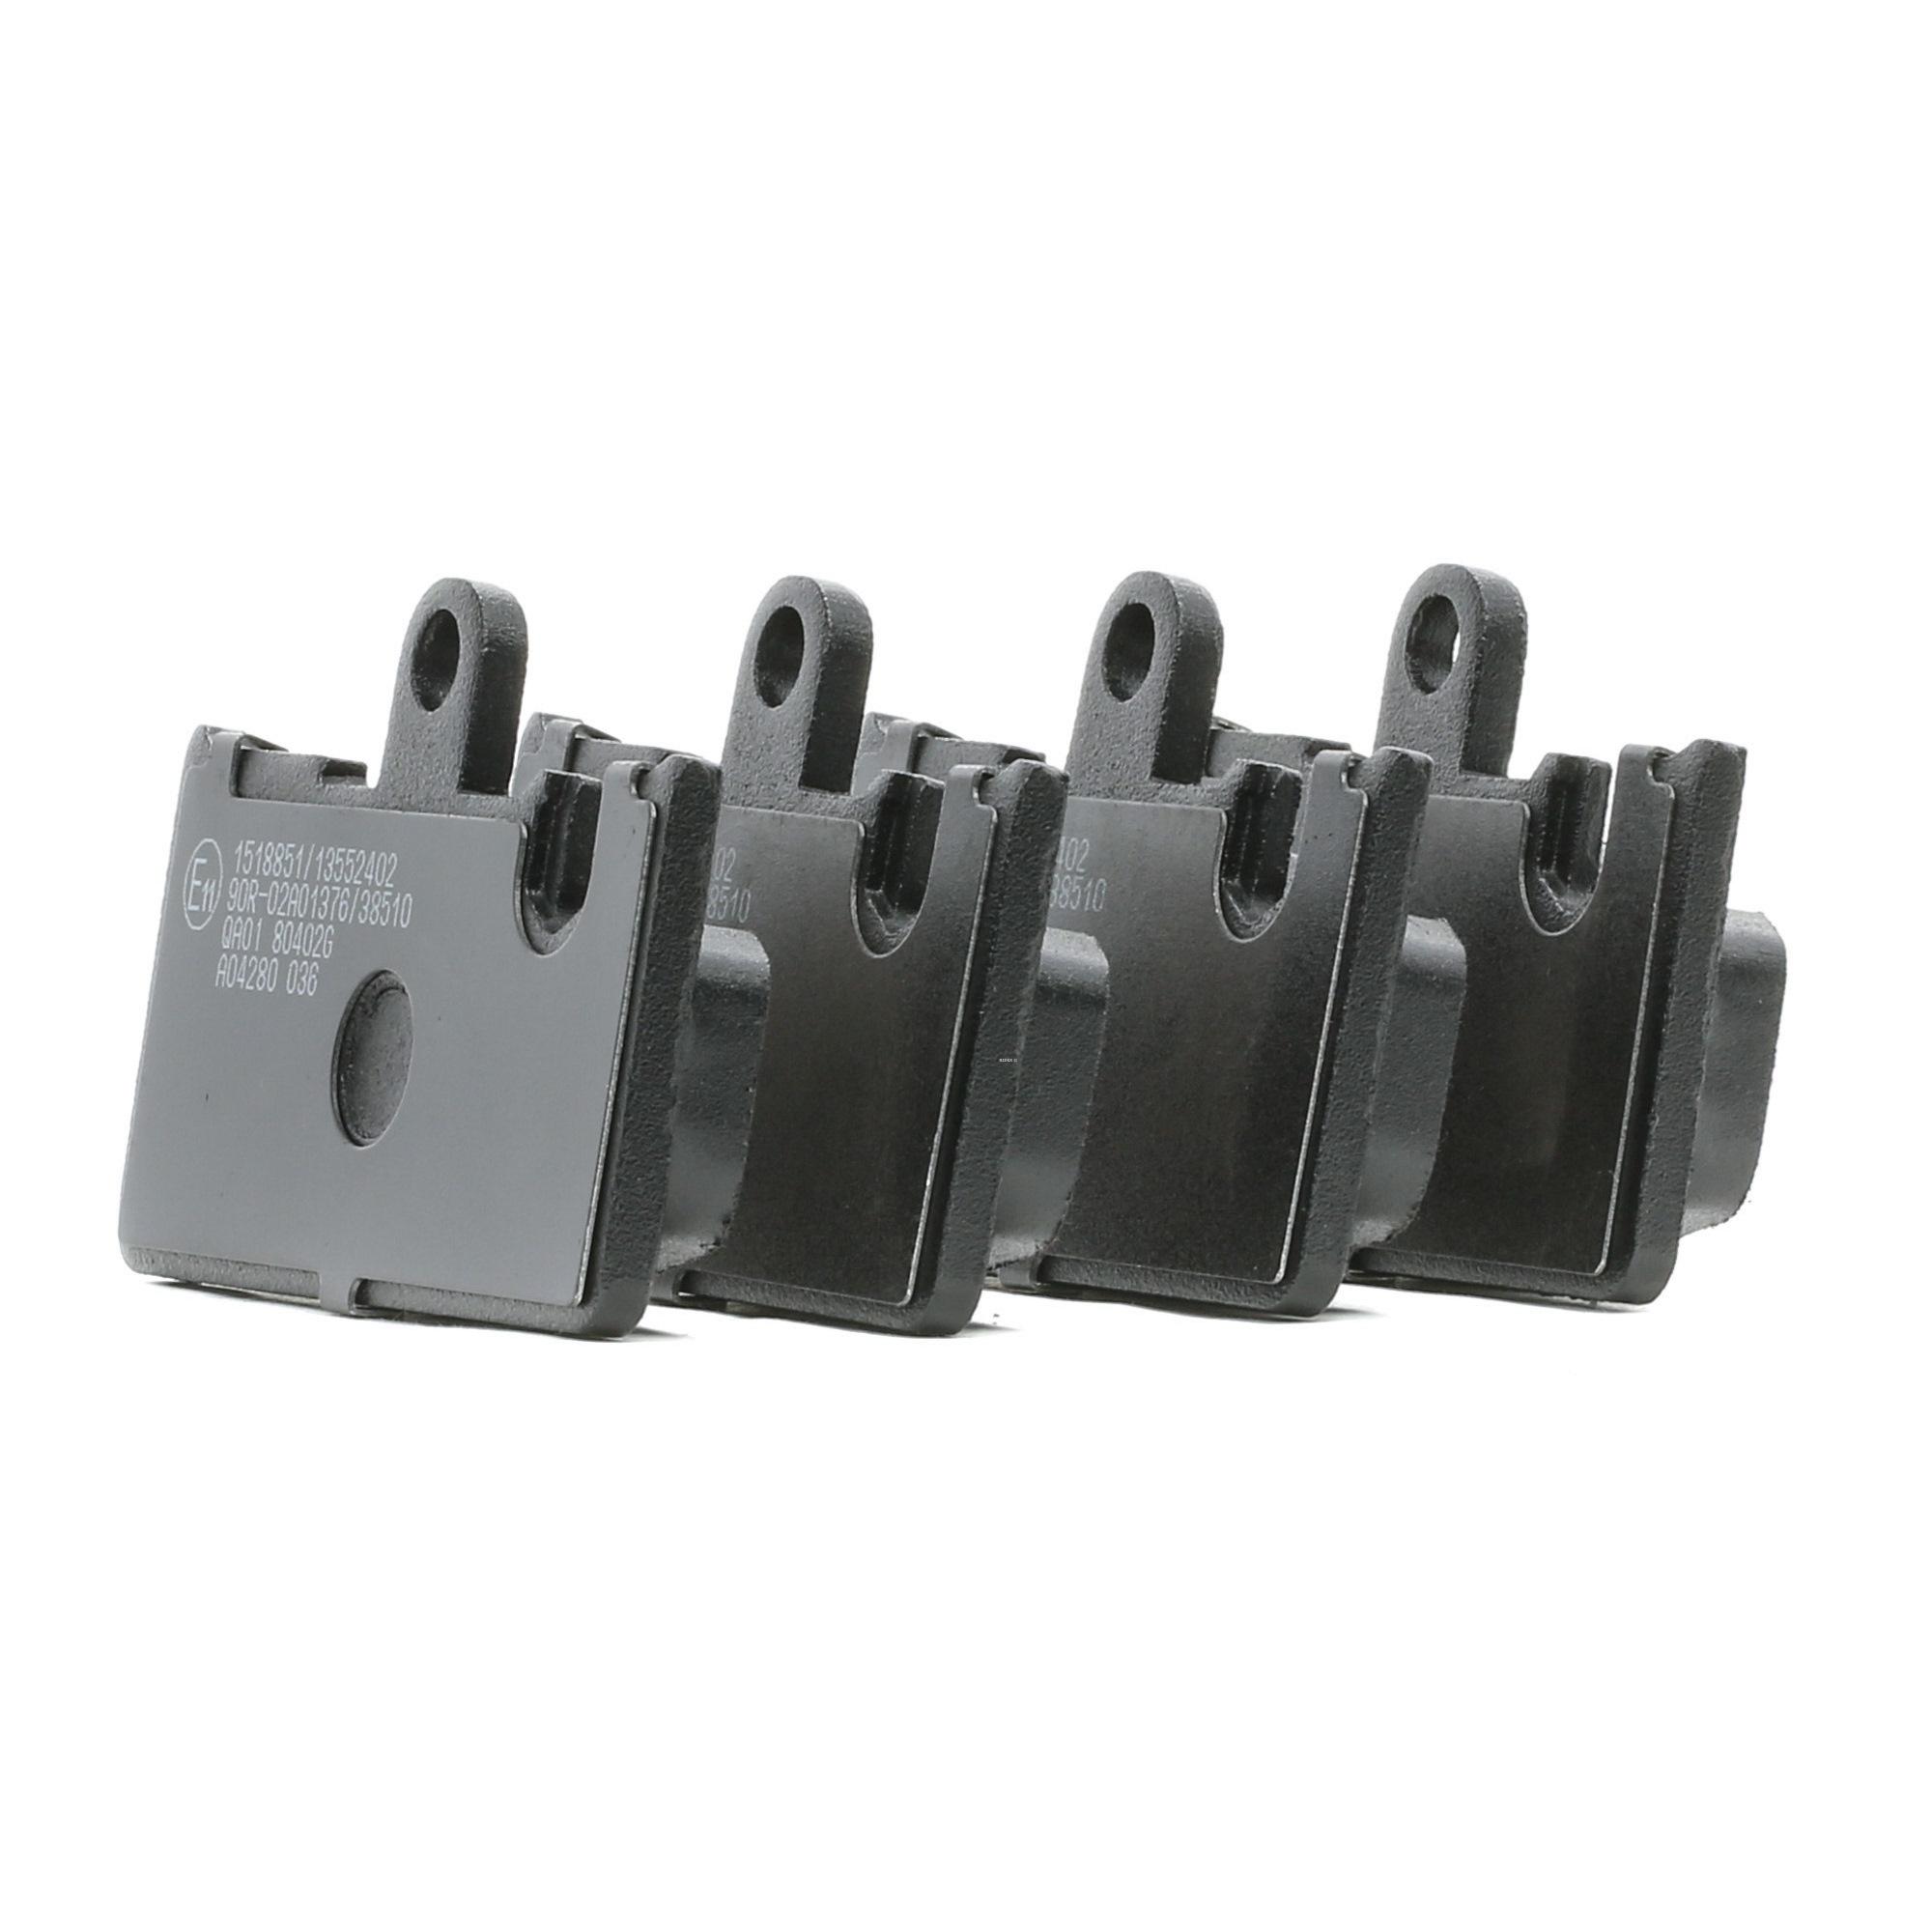 LEXUS LS 2021 Bremsklötze - Original RIDEX 402B1237 Höhe: 62.1mm, Breite: 96.1mm, Dicke/Stärke: 15mm